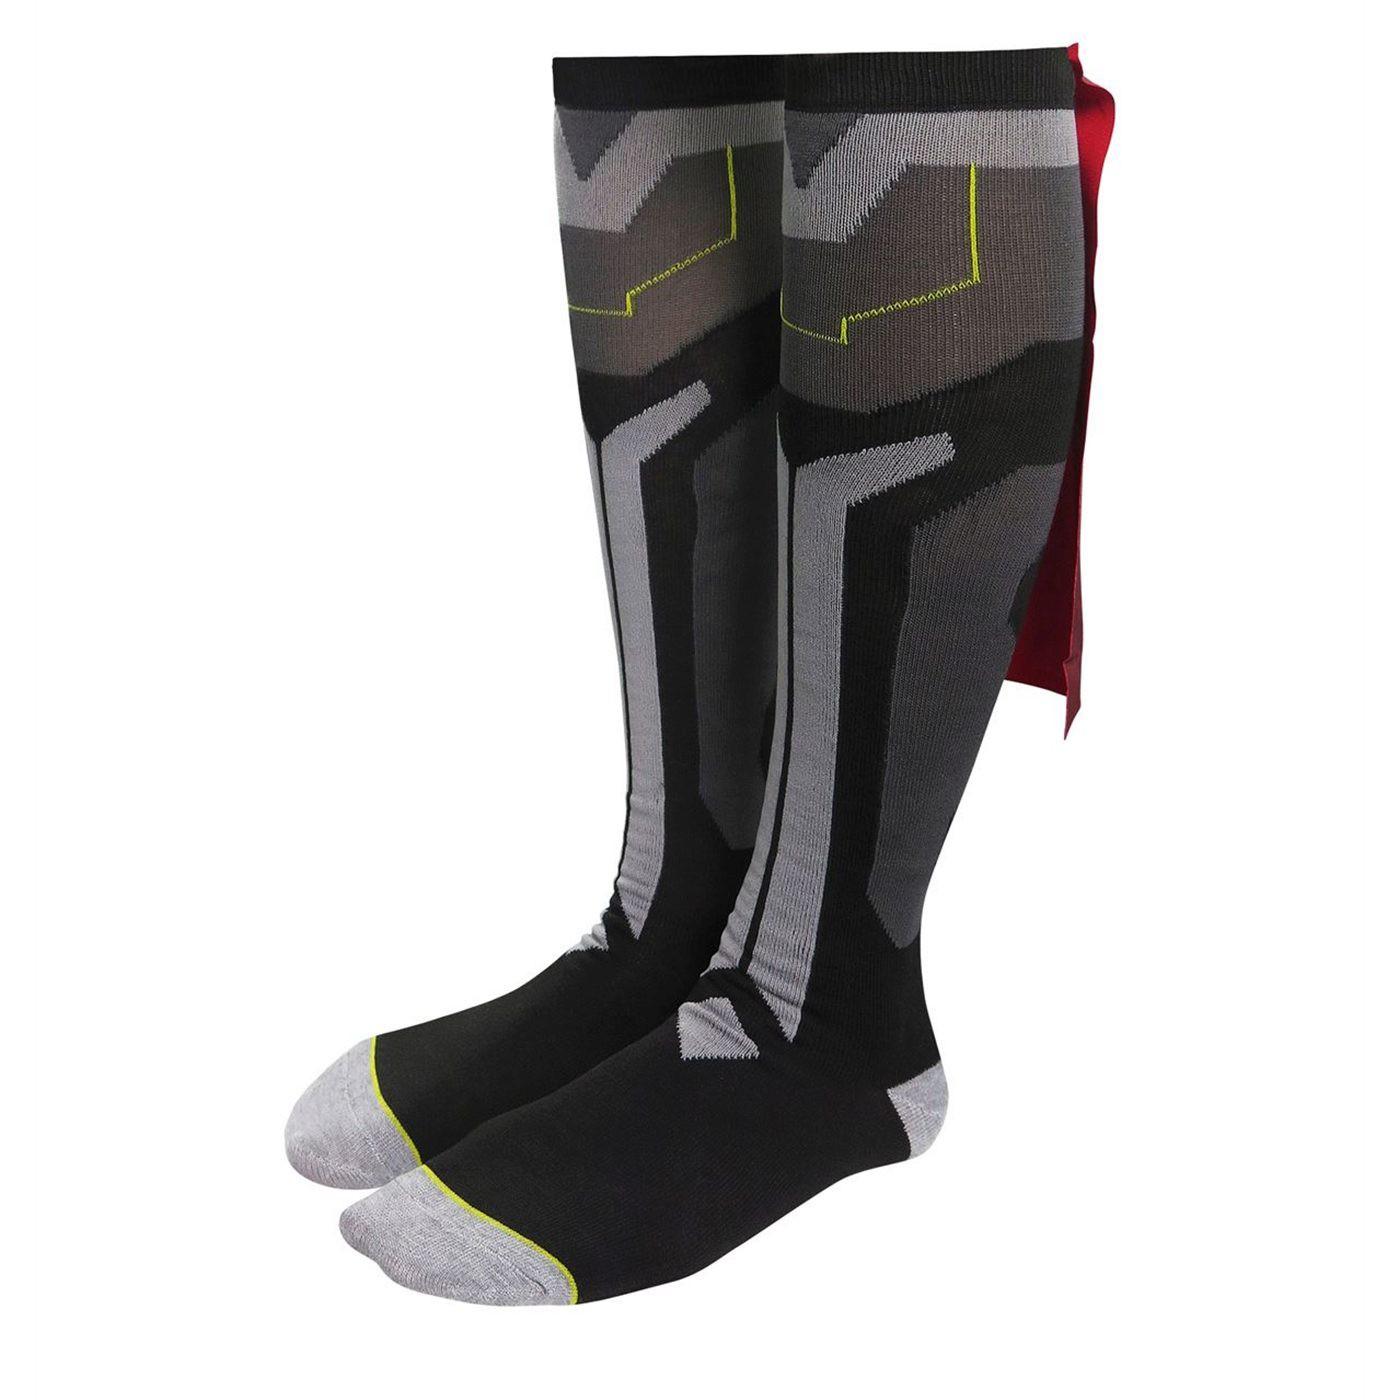 Thor Ragnarok Costume & Caped Knee High Socks